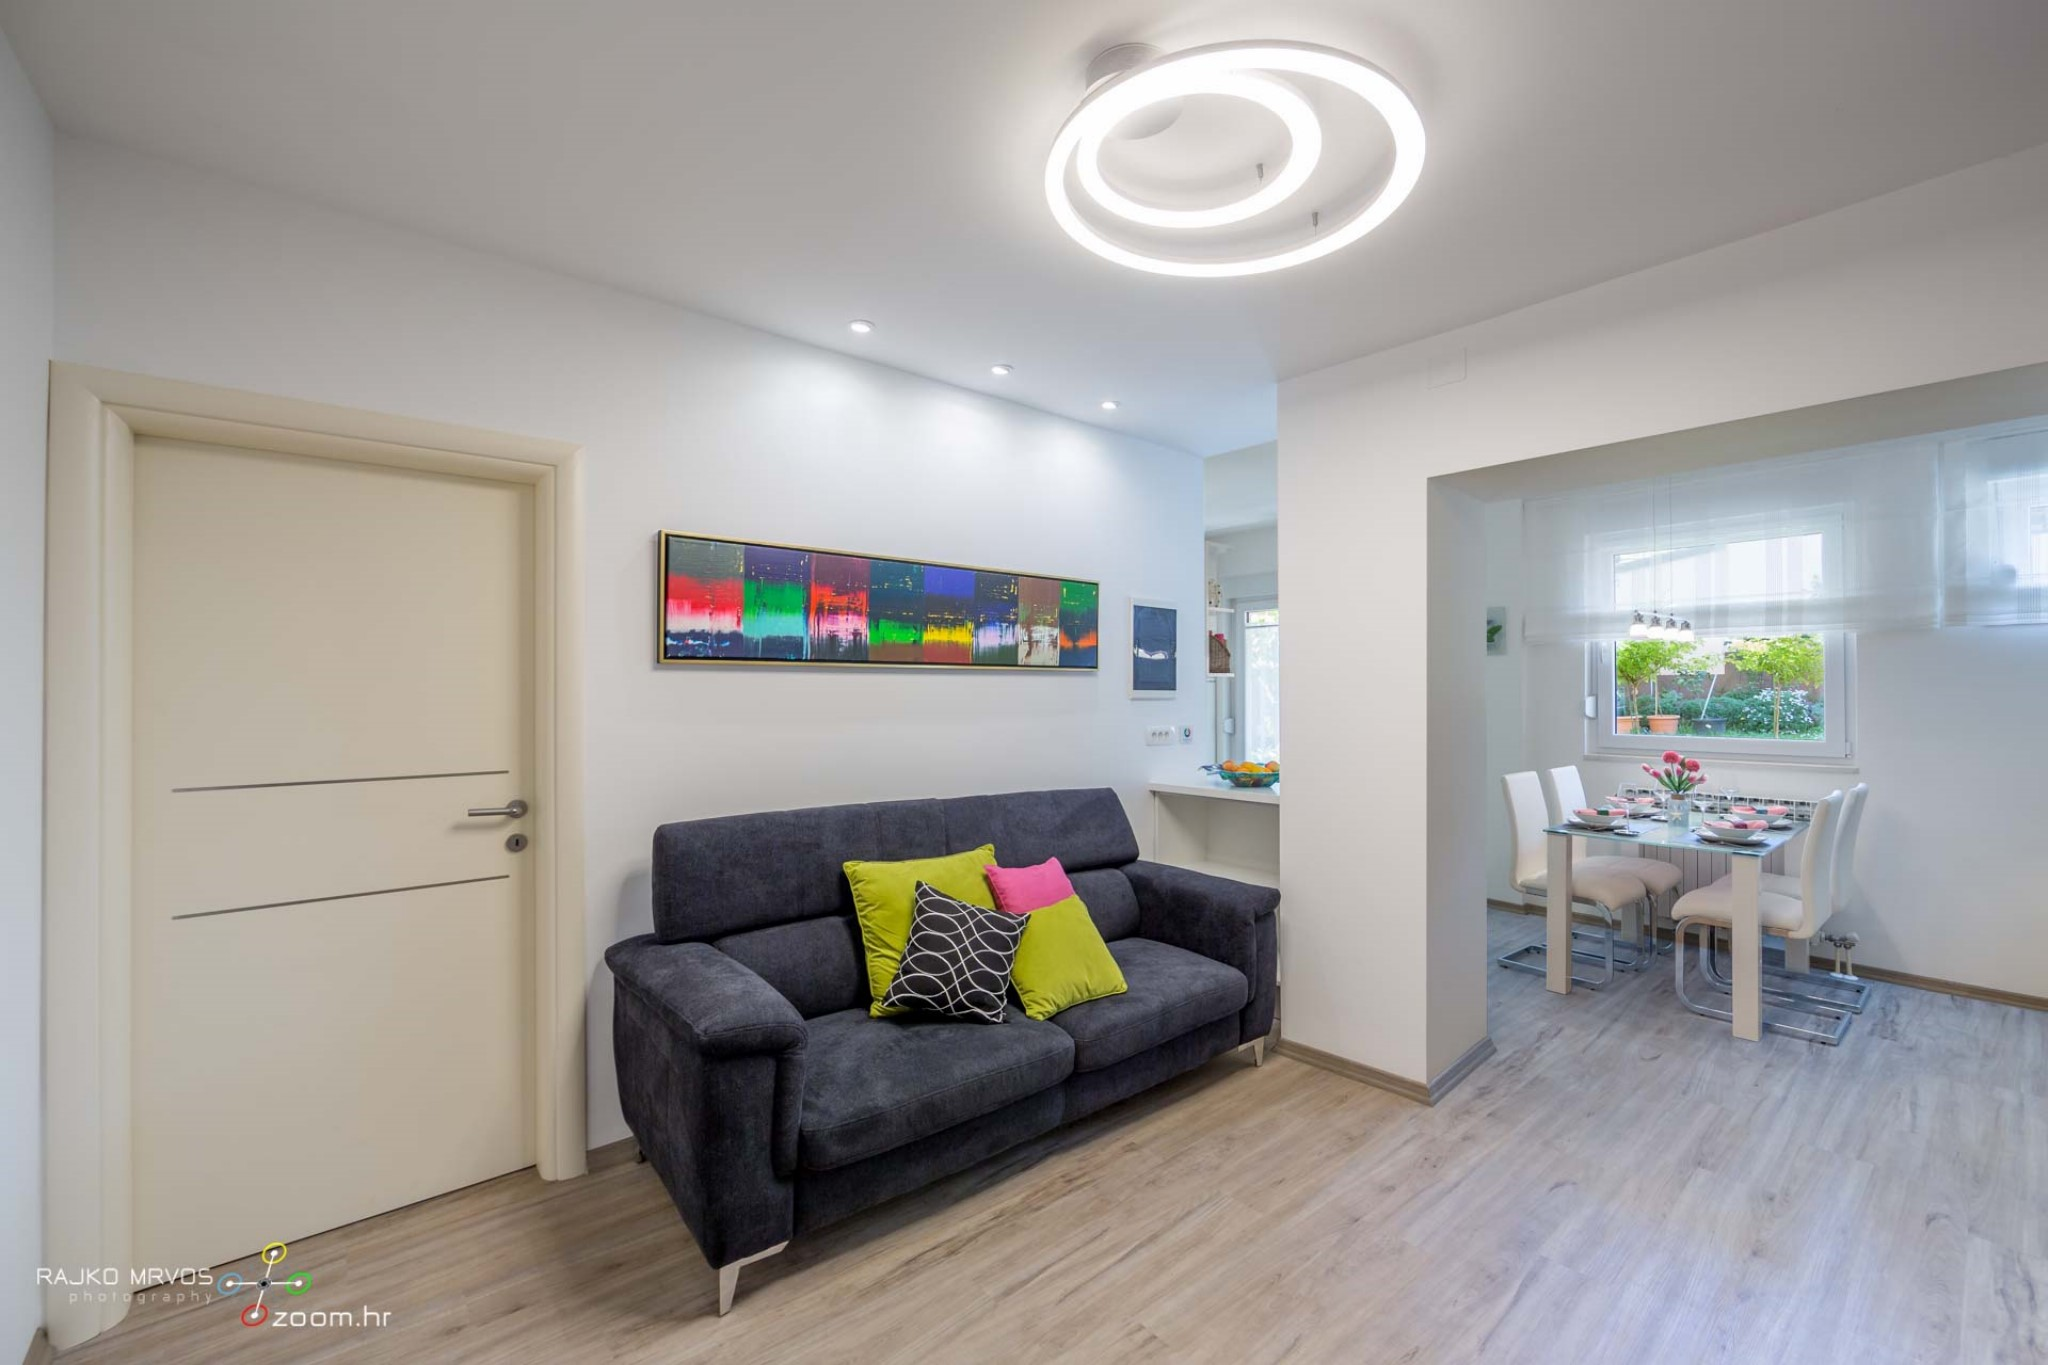 fotografiranje-interijera-fotograf-eksterijera-vila-apartmana-kuca-apartmani-Dujmic-8